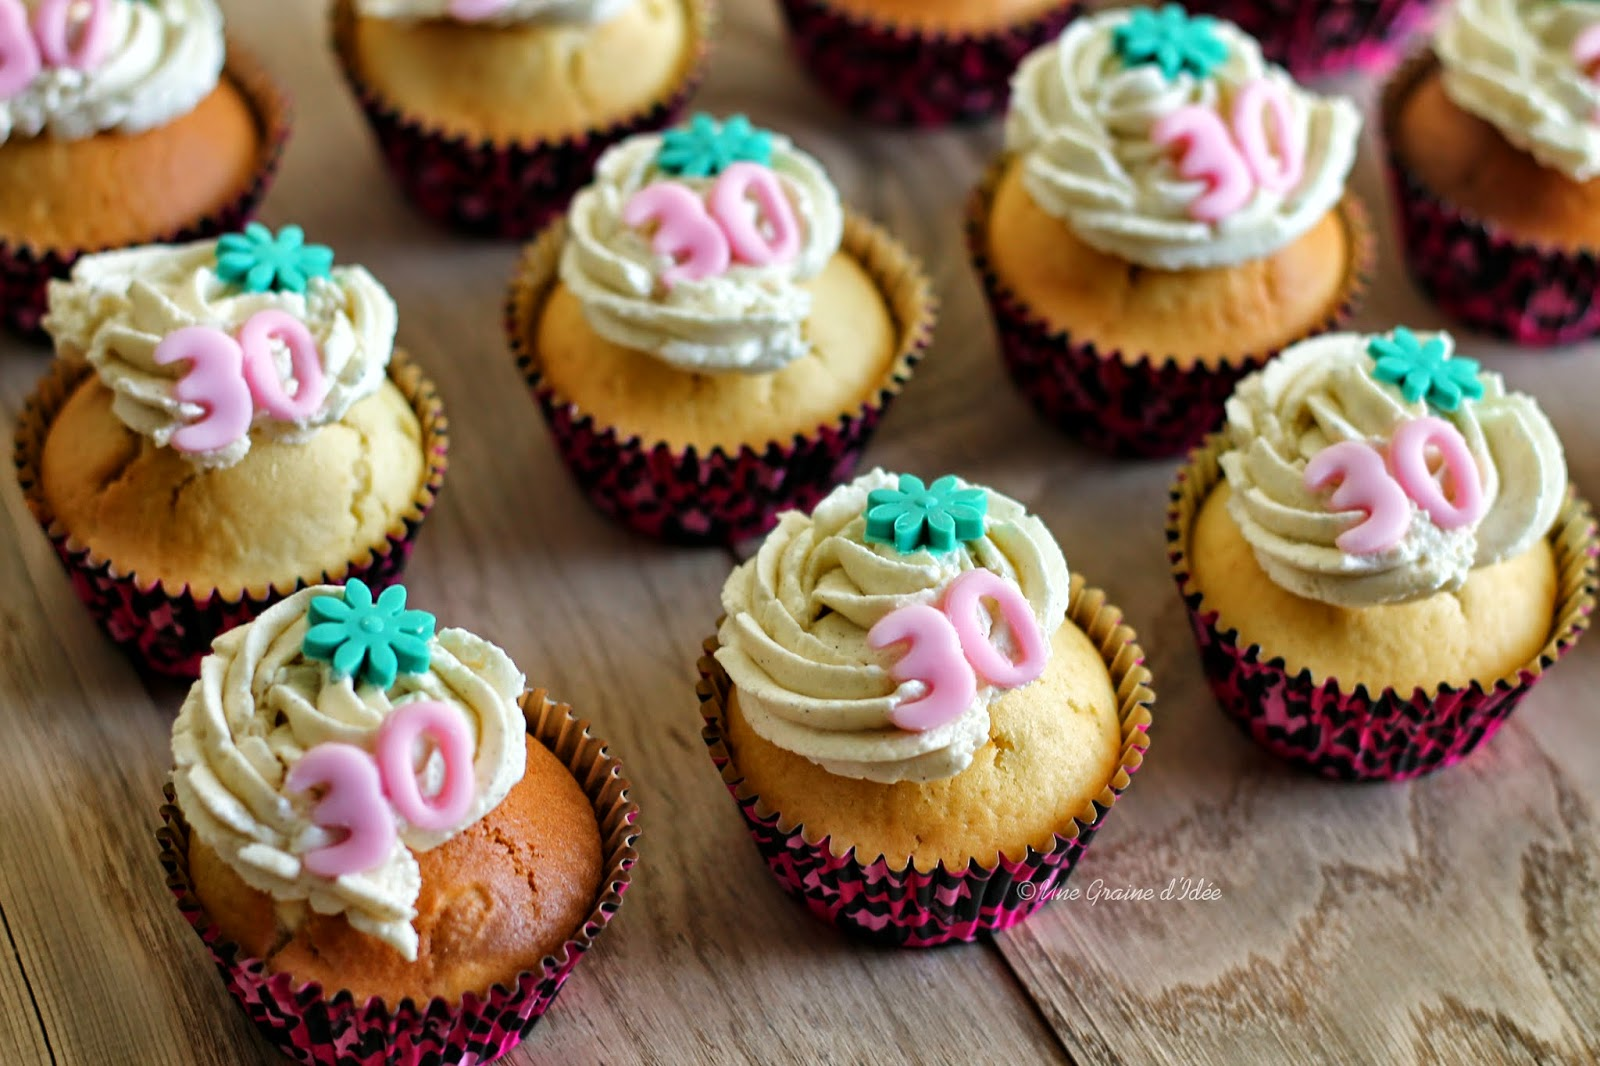 Cupcake Madeleine Nutella Anniversaire Une Graine d'Idée